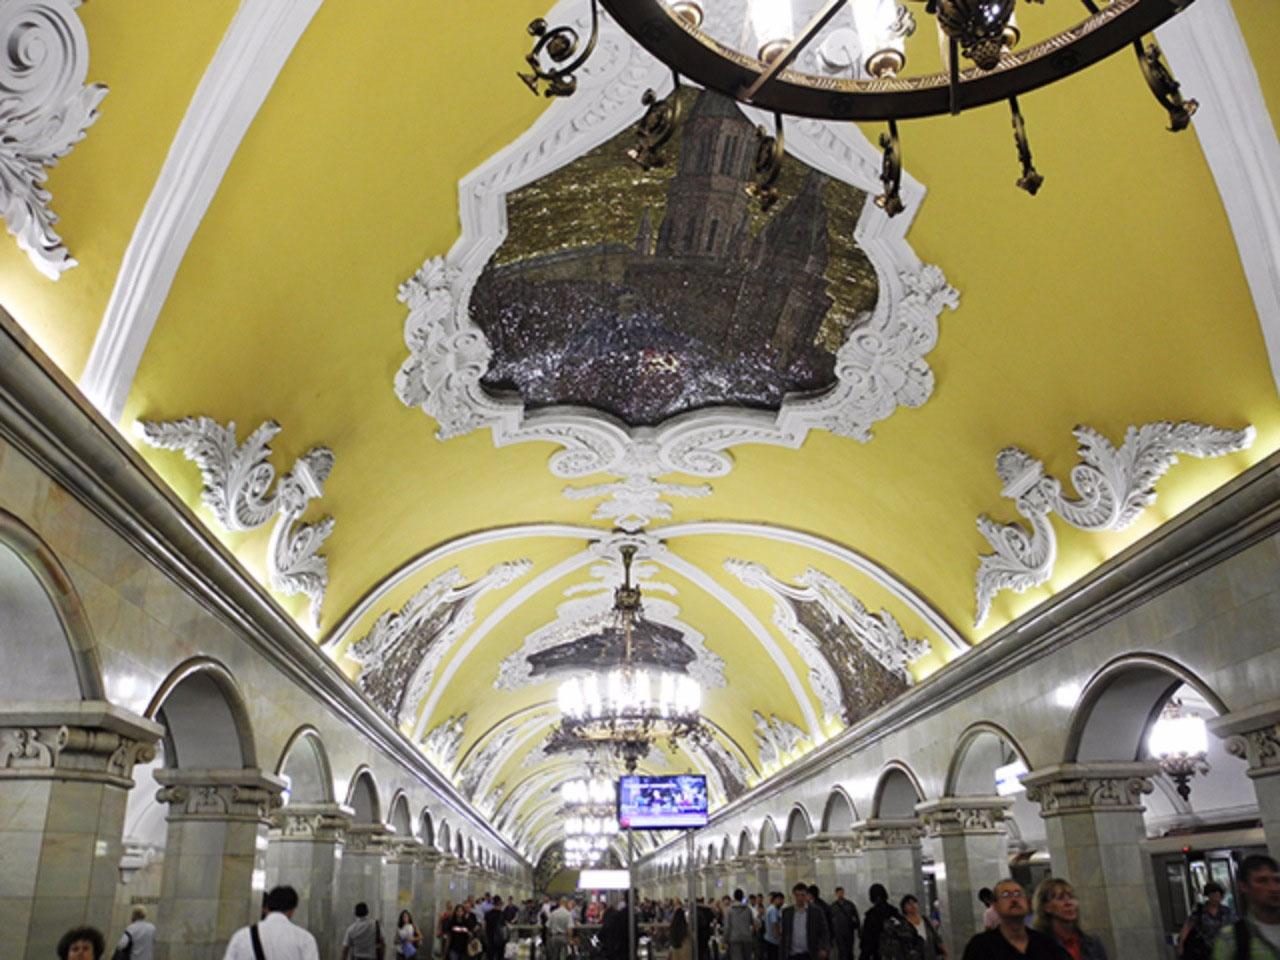 Komsomolskaya station: Russian freedom fight